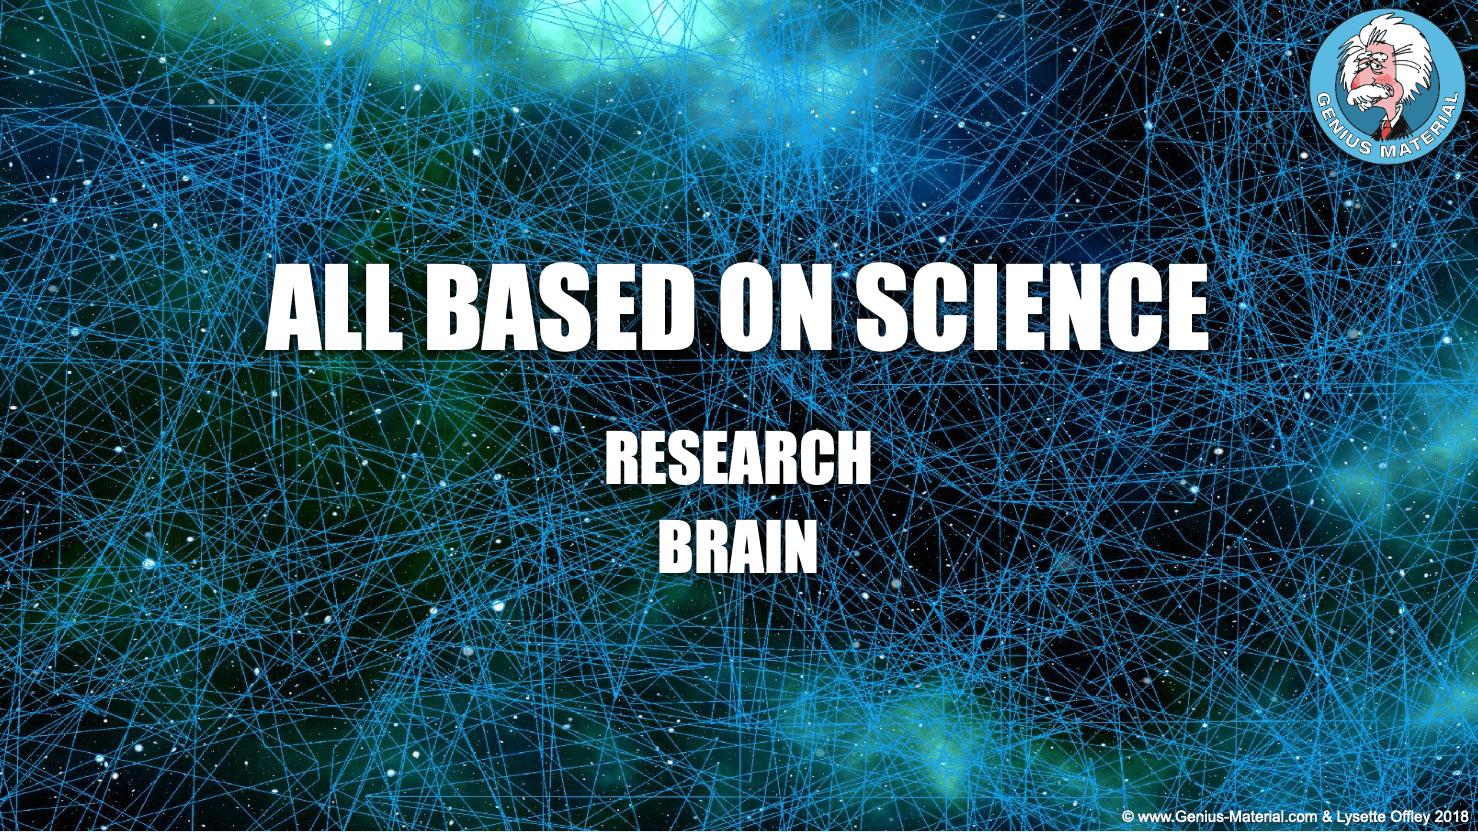 Slogan: All based on science